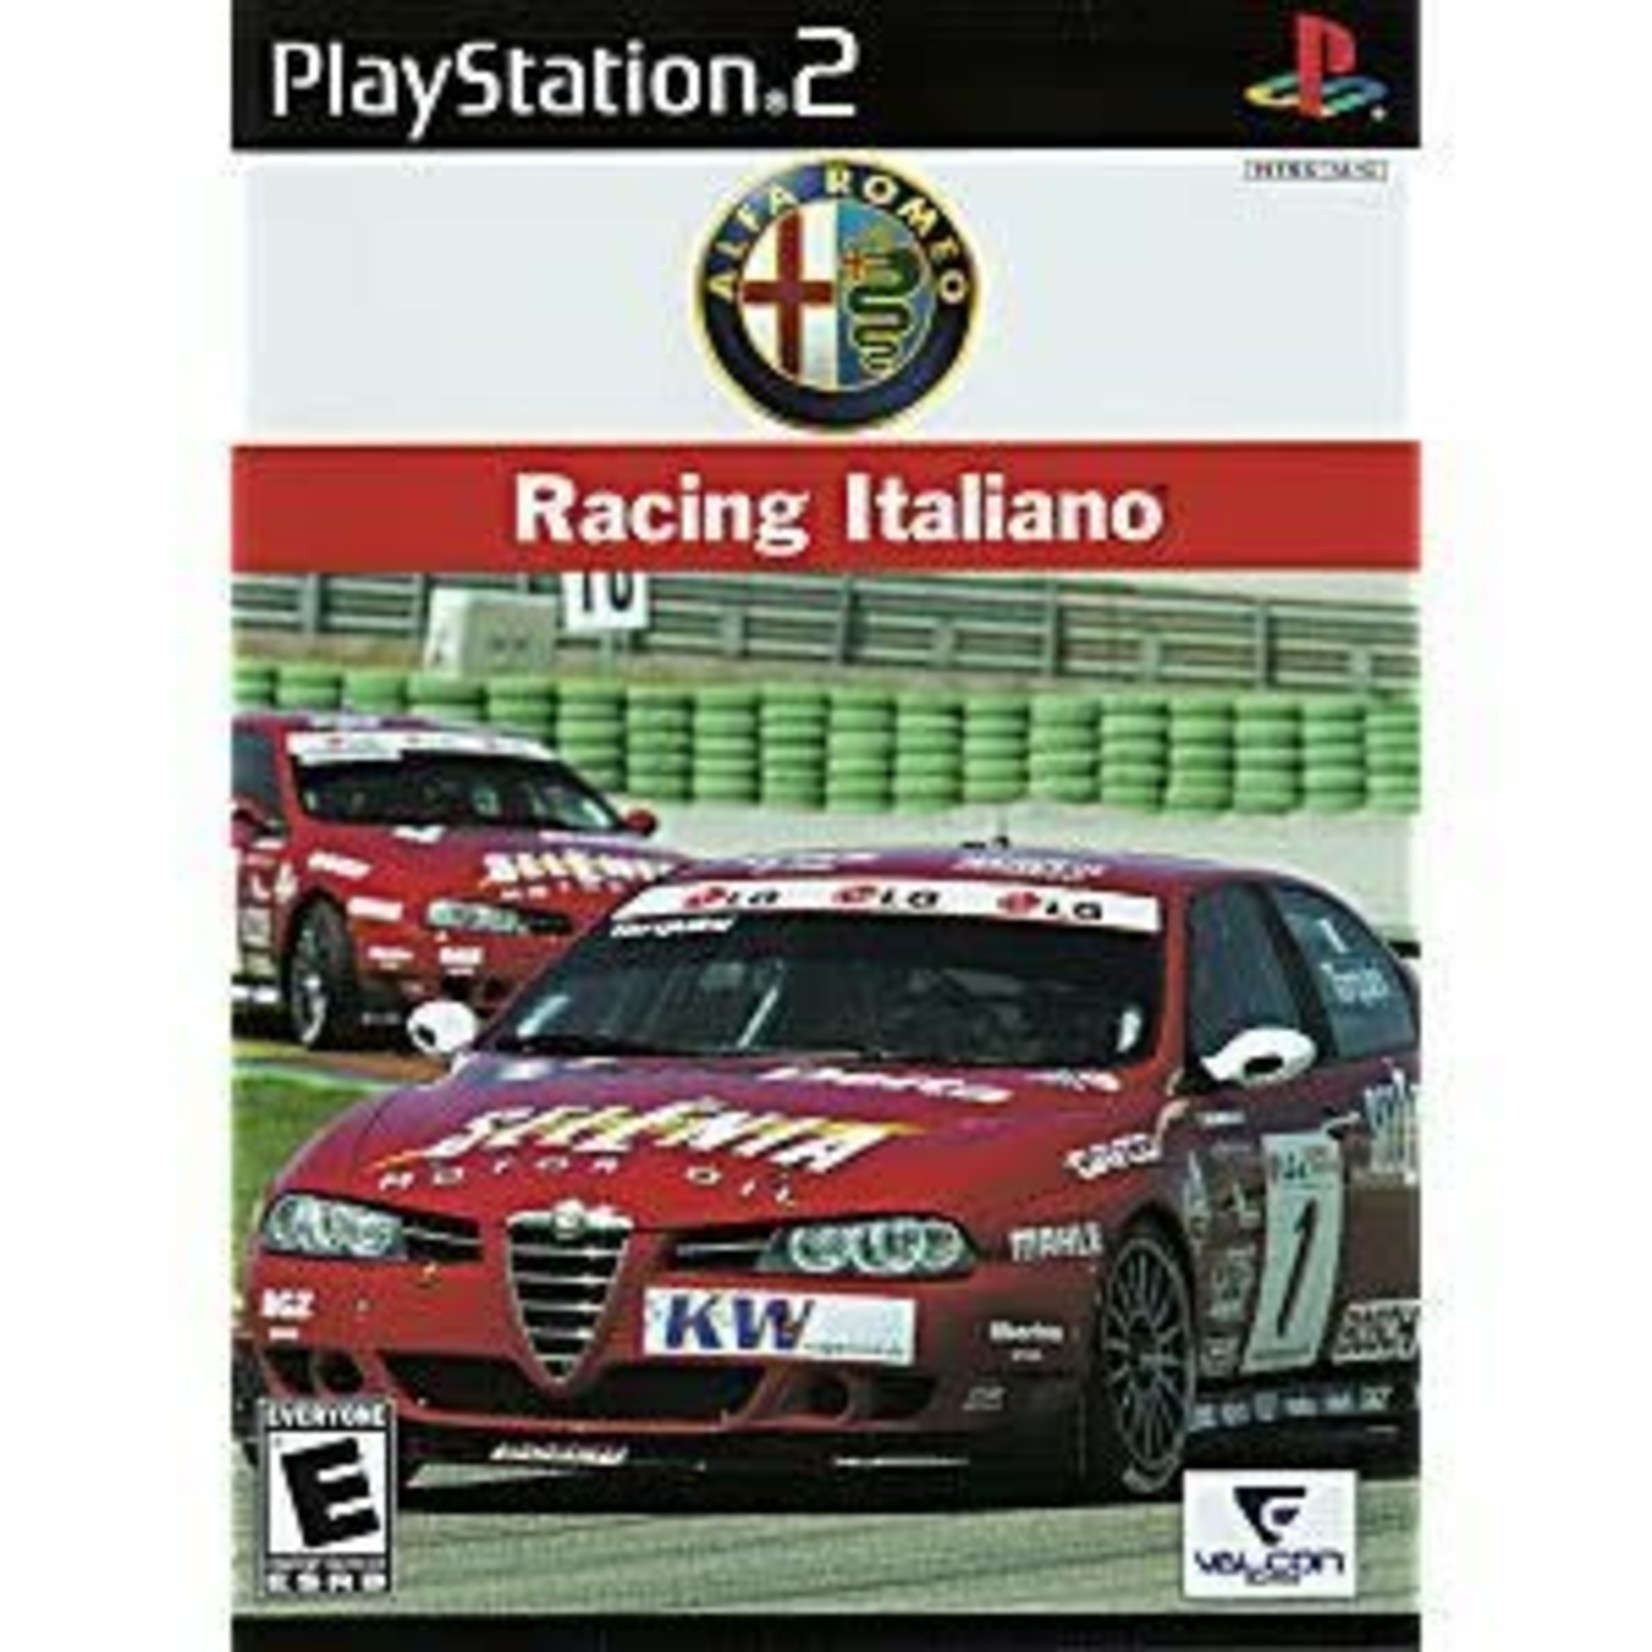 PS2u-ALFA Romeo Racing Italiano